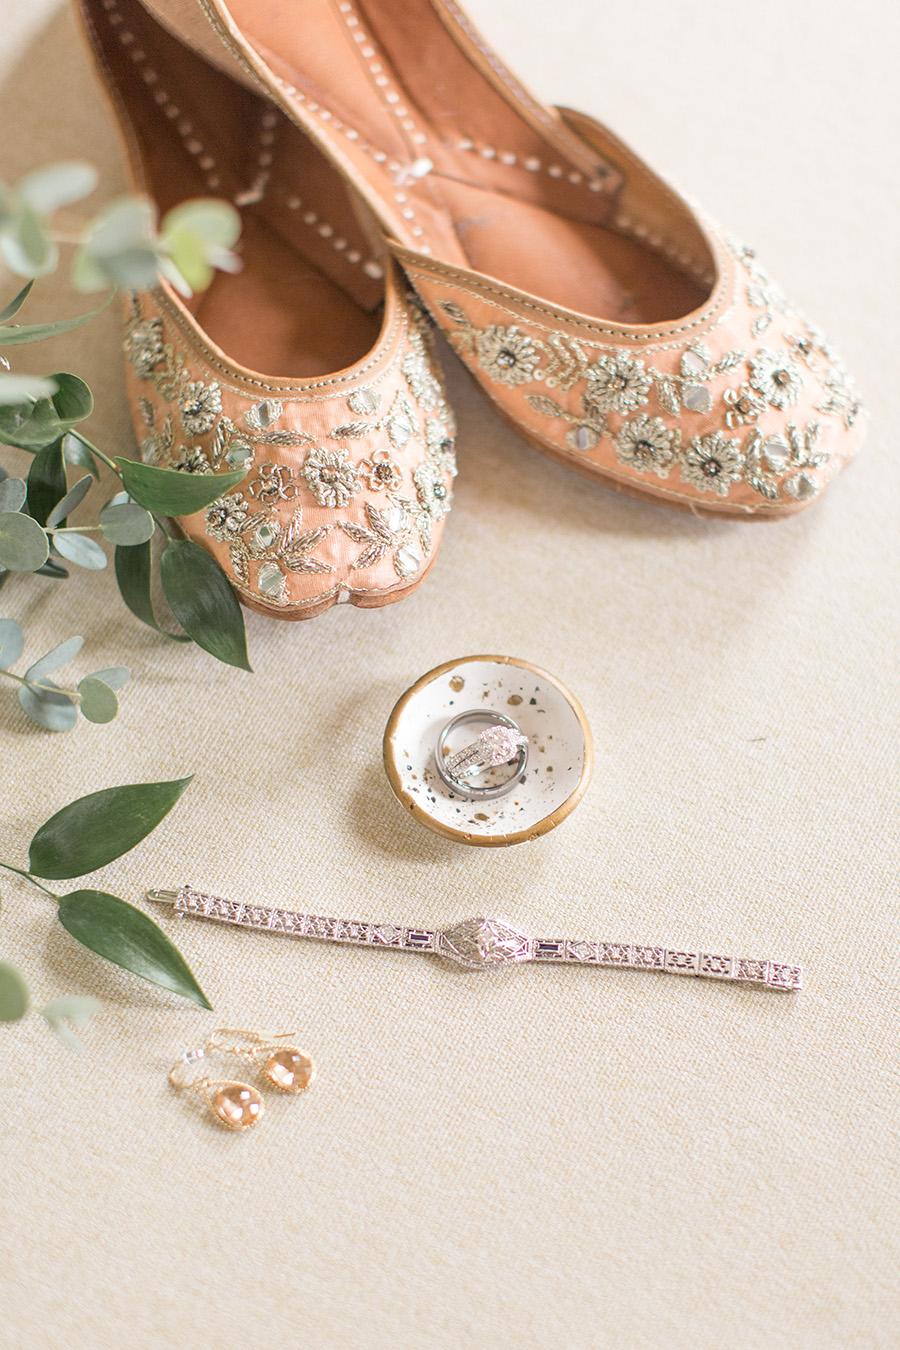 bride's peach embroidered ballet wedding flats